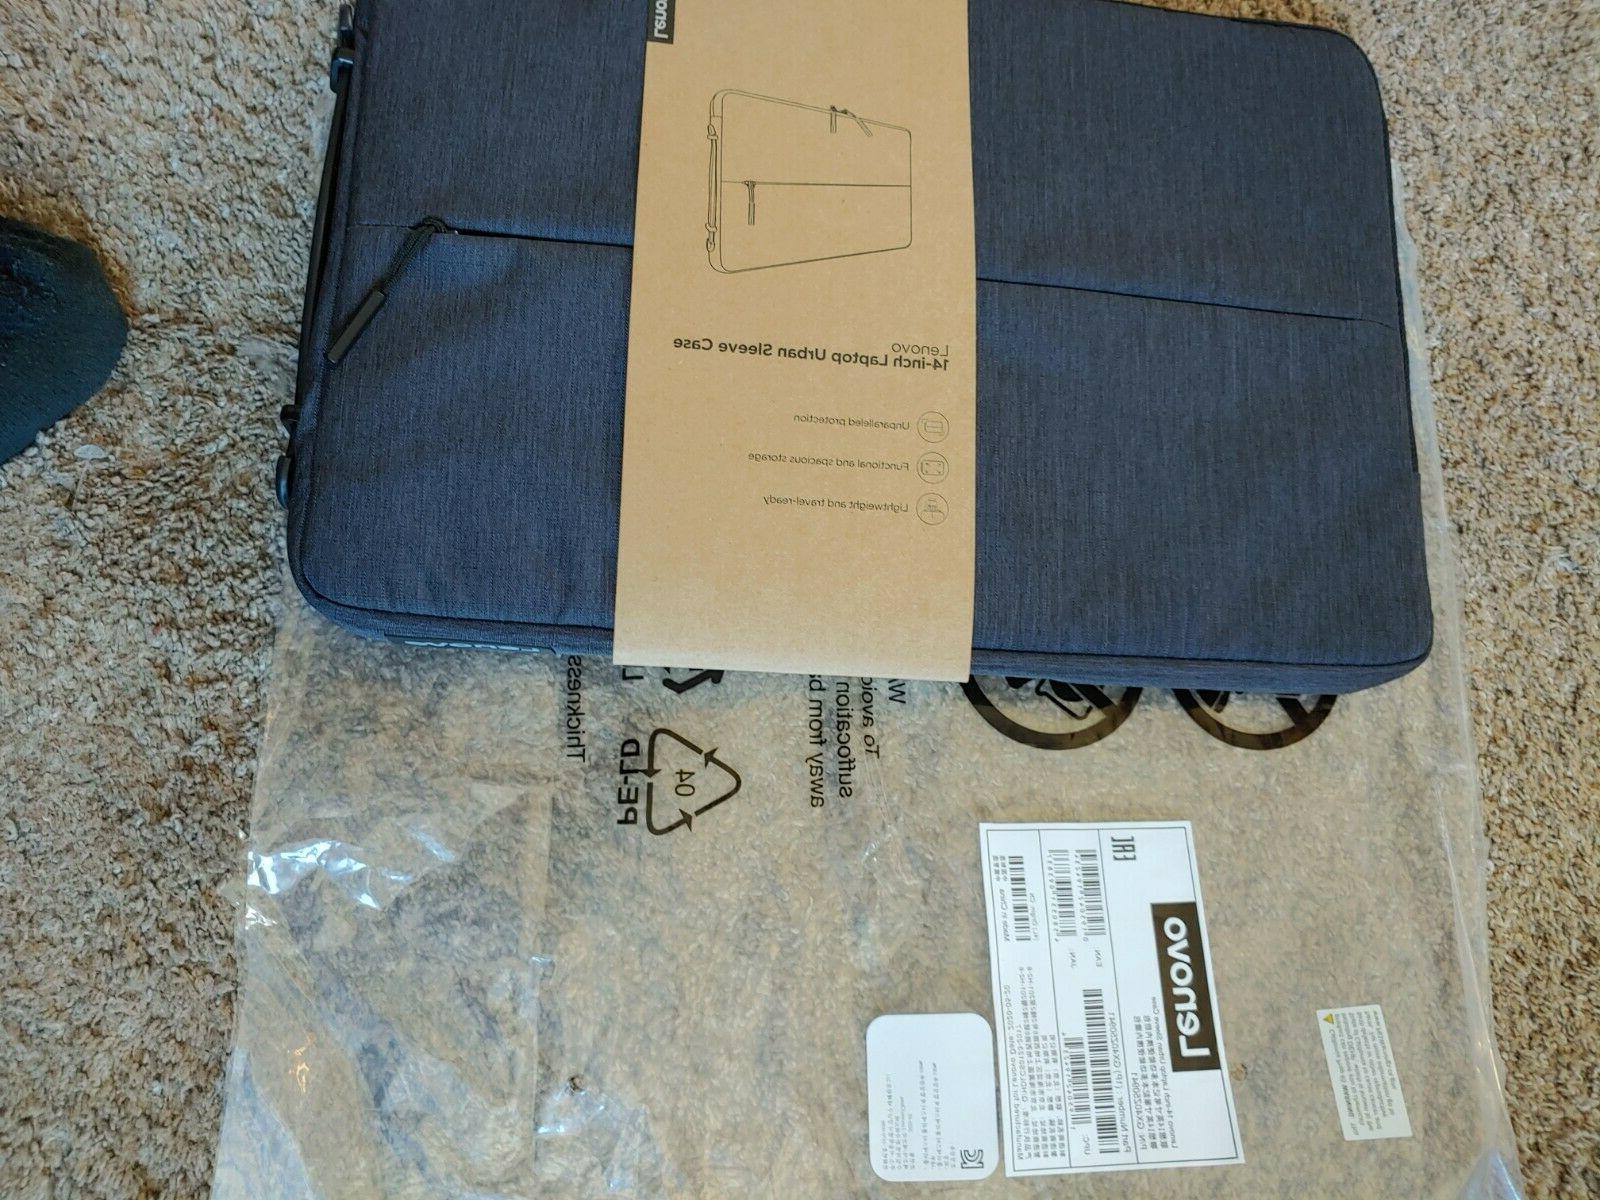 15 6 inch laptop urban sleeve case